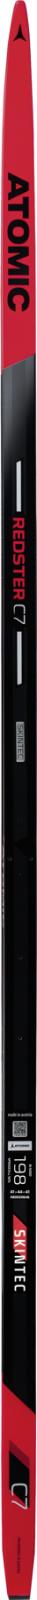 Atomic Redster C7 X Stiff